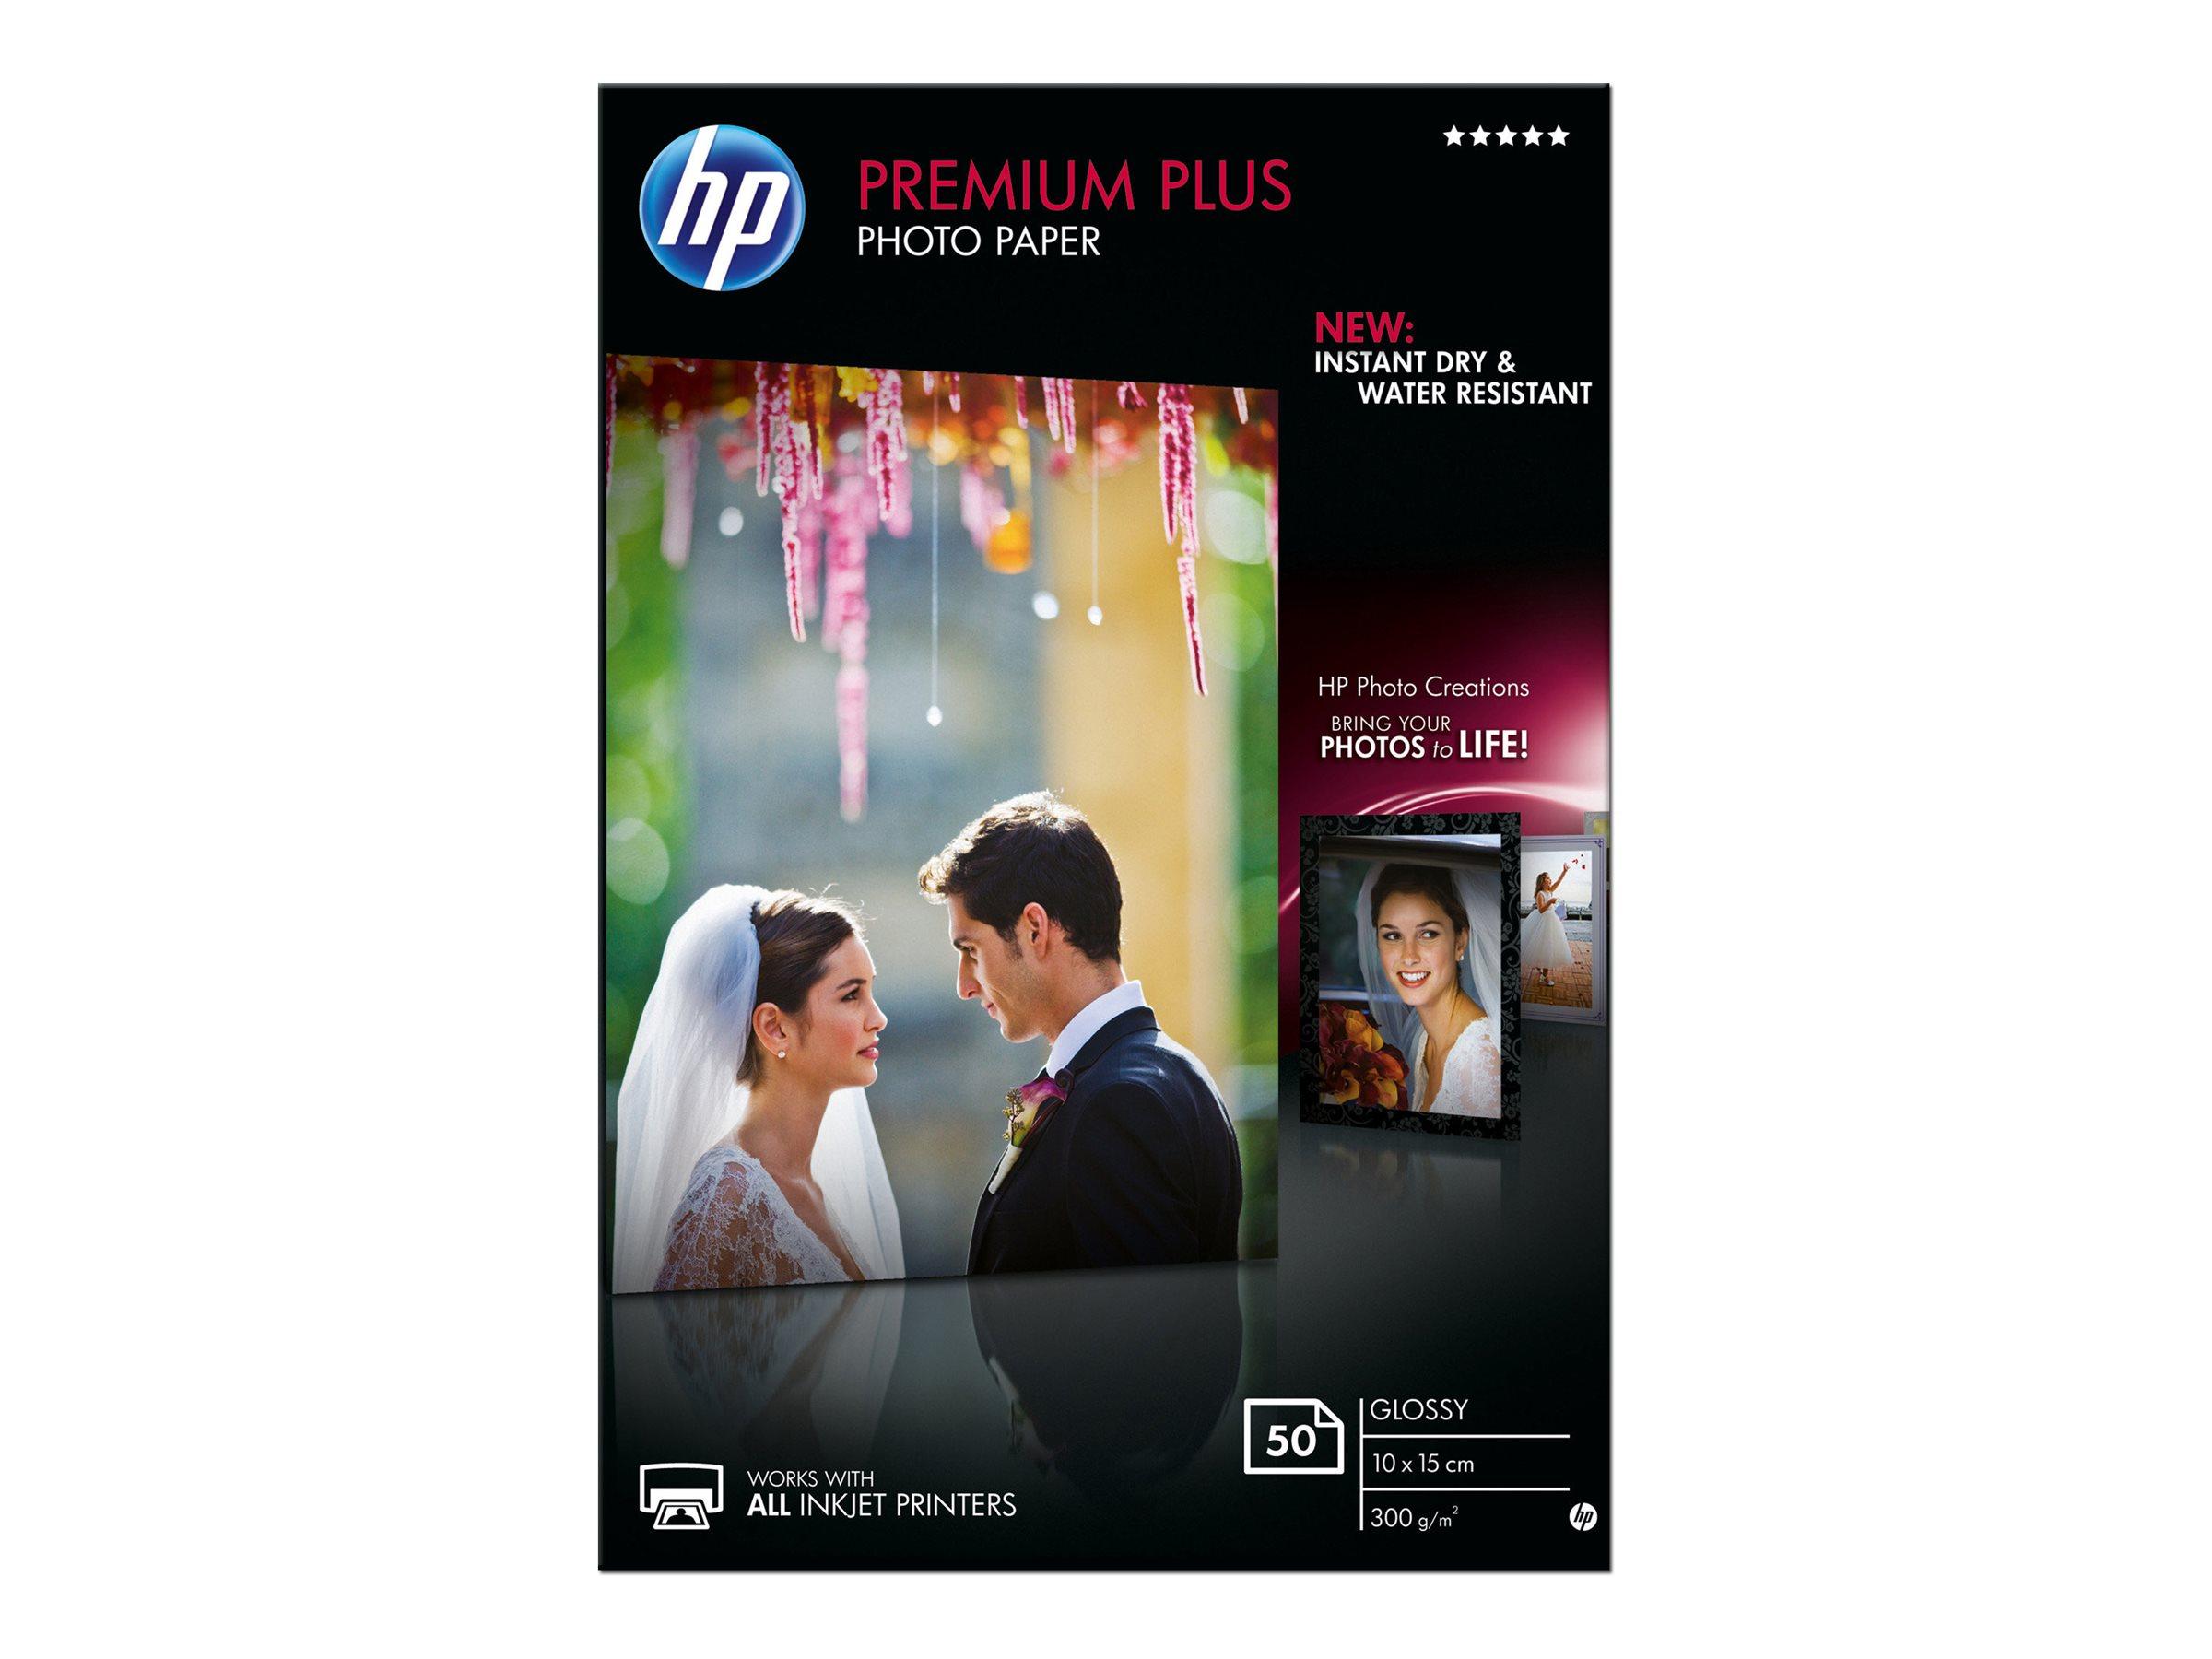 HP Premium Plus Photo Paper - Glänzend - 100 x 150 mm - 300 g/m² - 50 Blatt Fotopapier - für Envy 50XX, 7645; Officejet 52XX; Pa